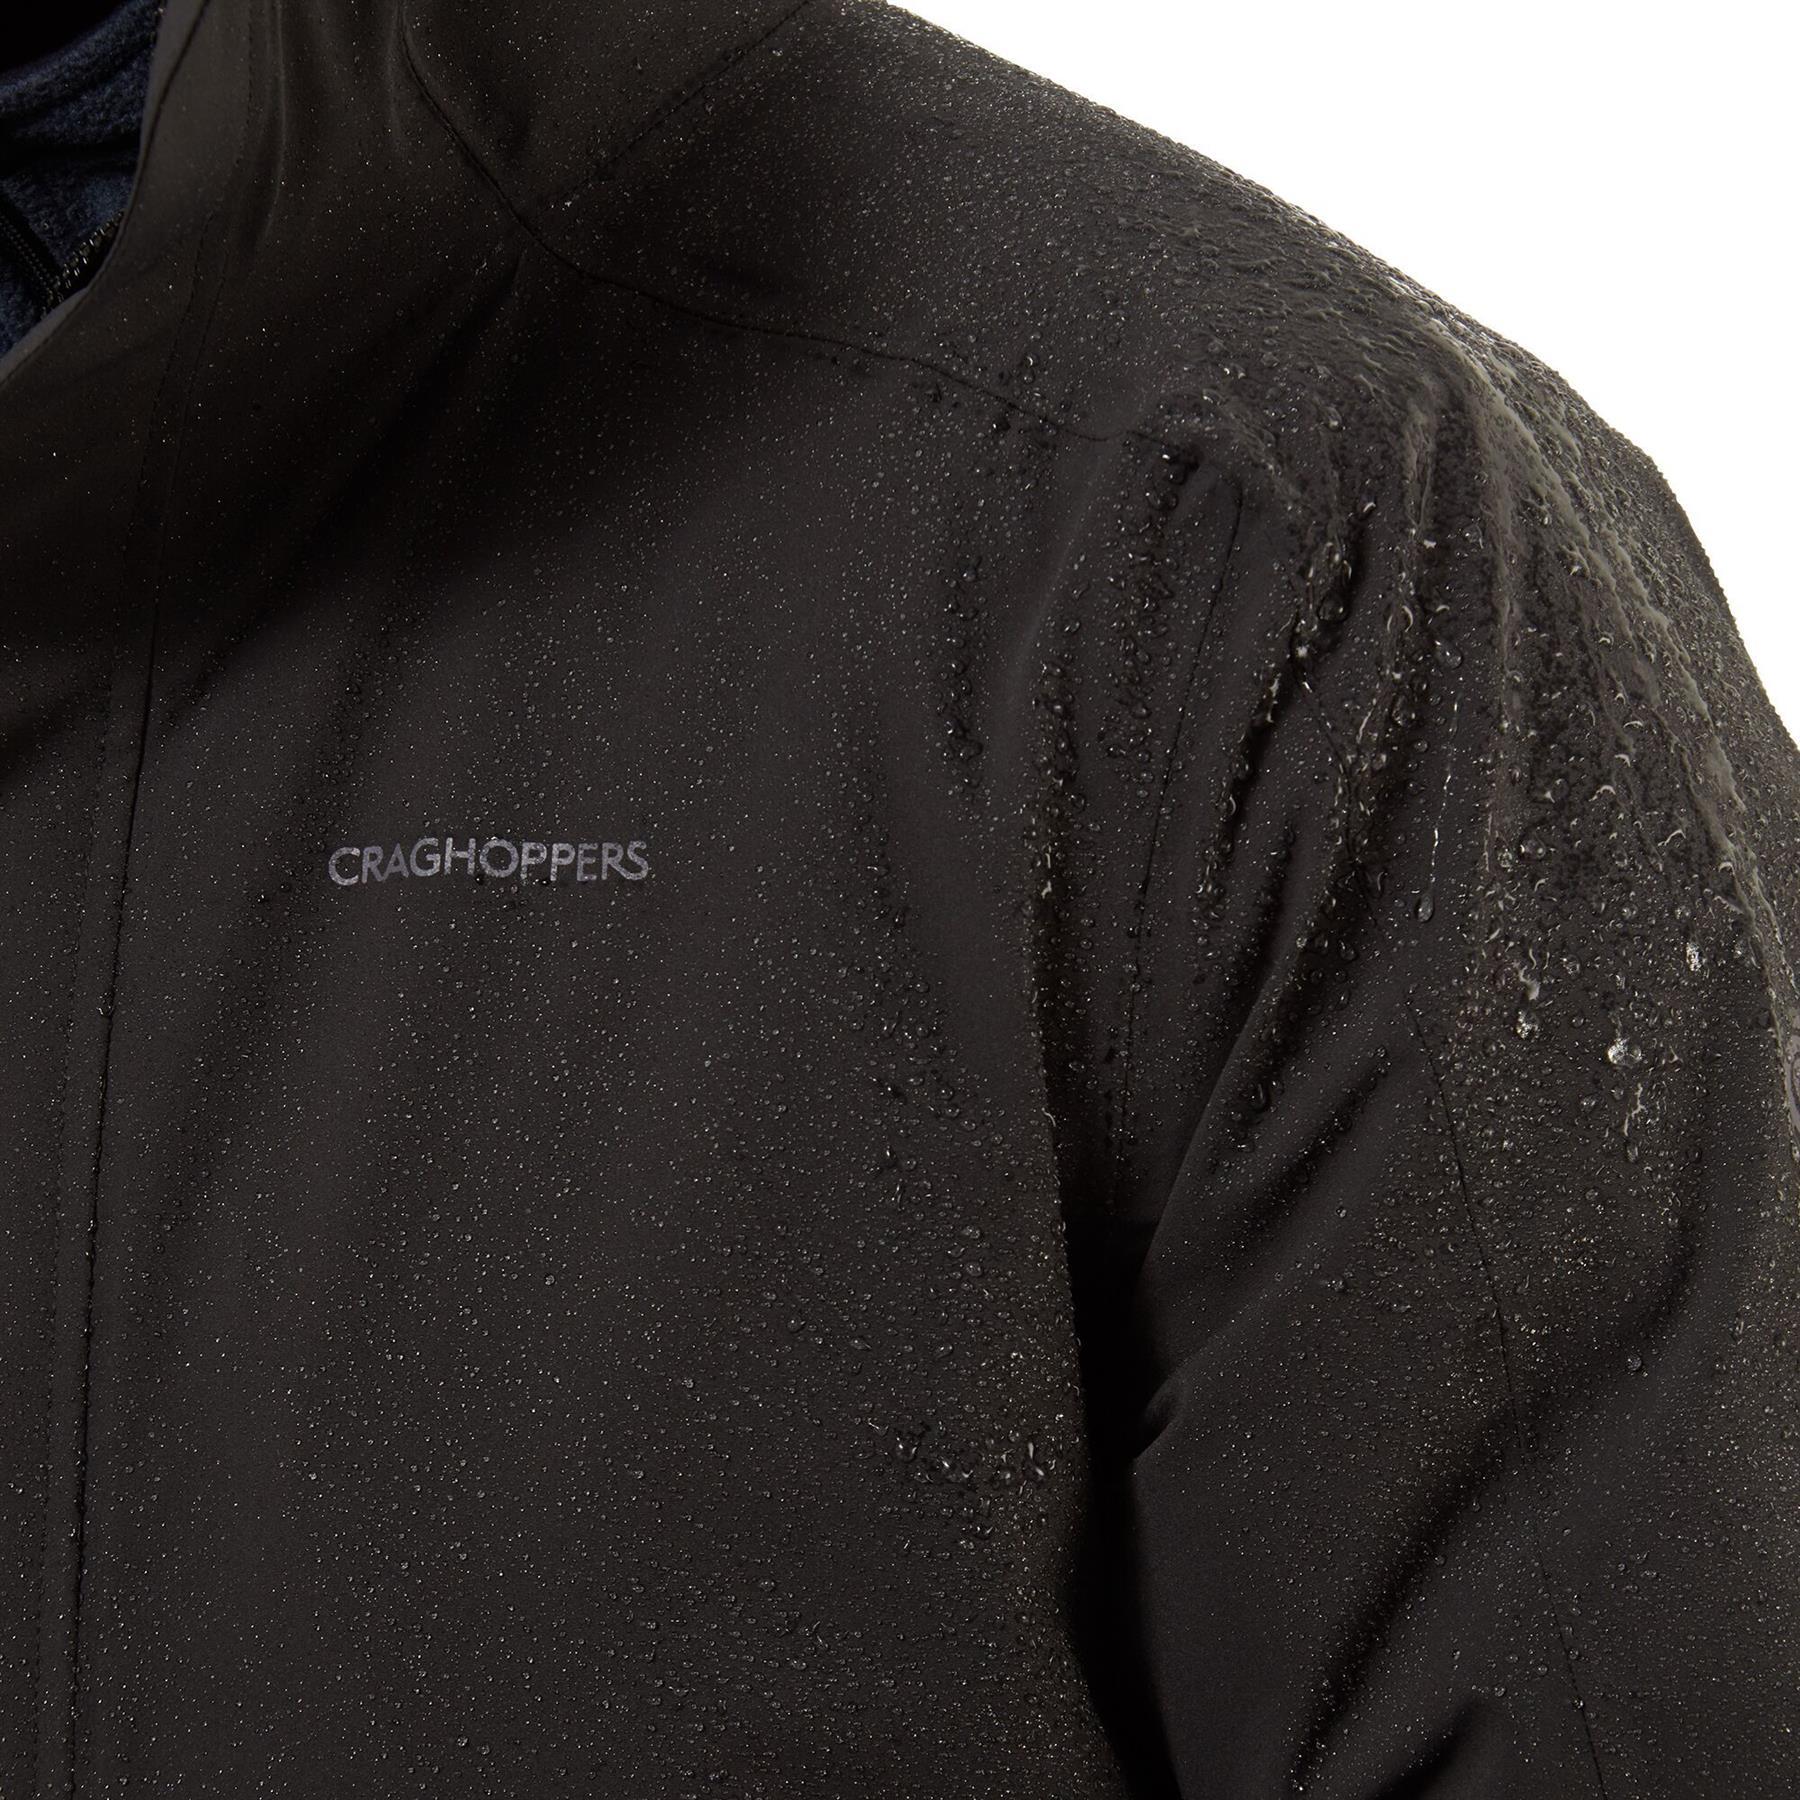 Craghoppers Lorton Thermic Waterproof Jacket